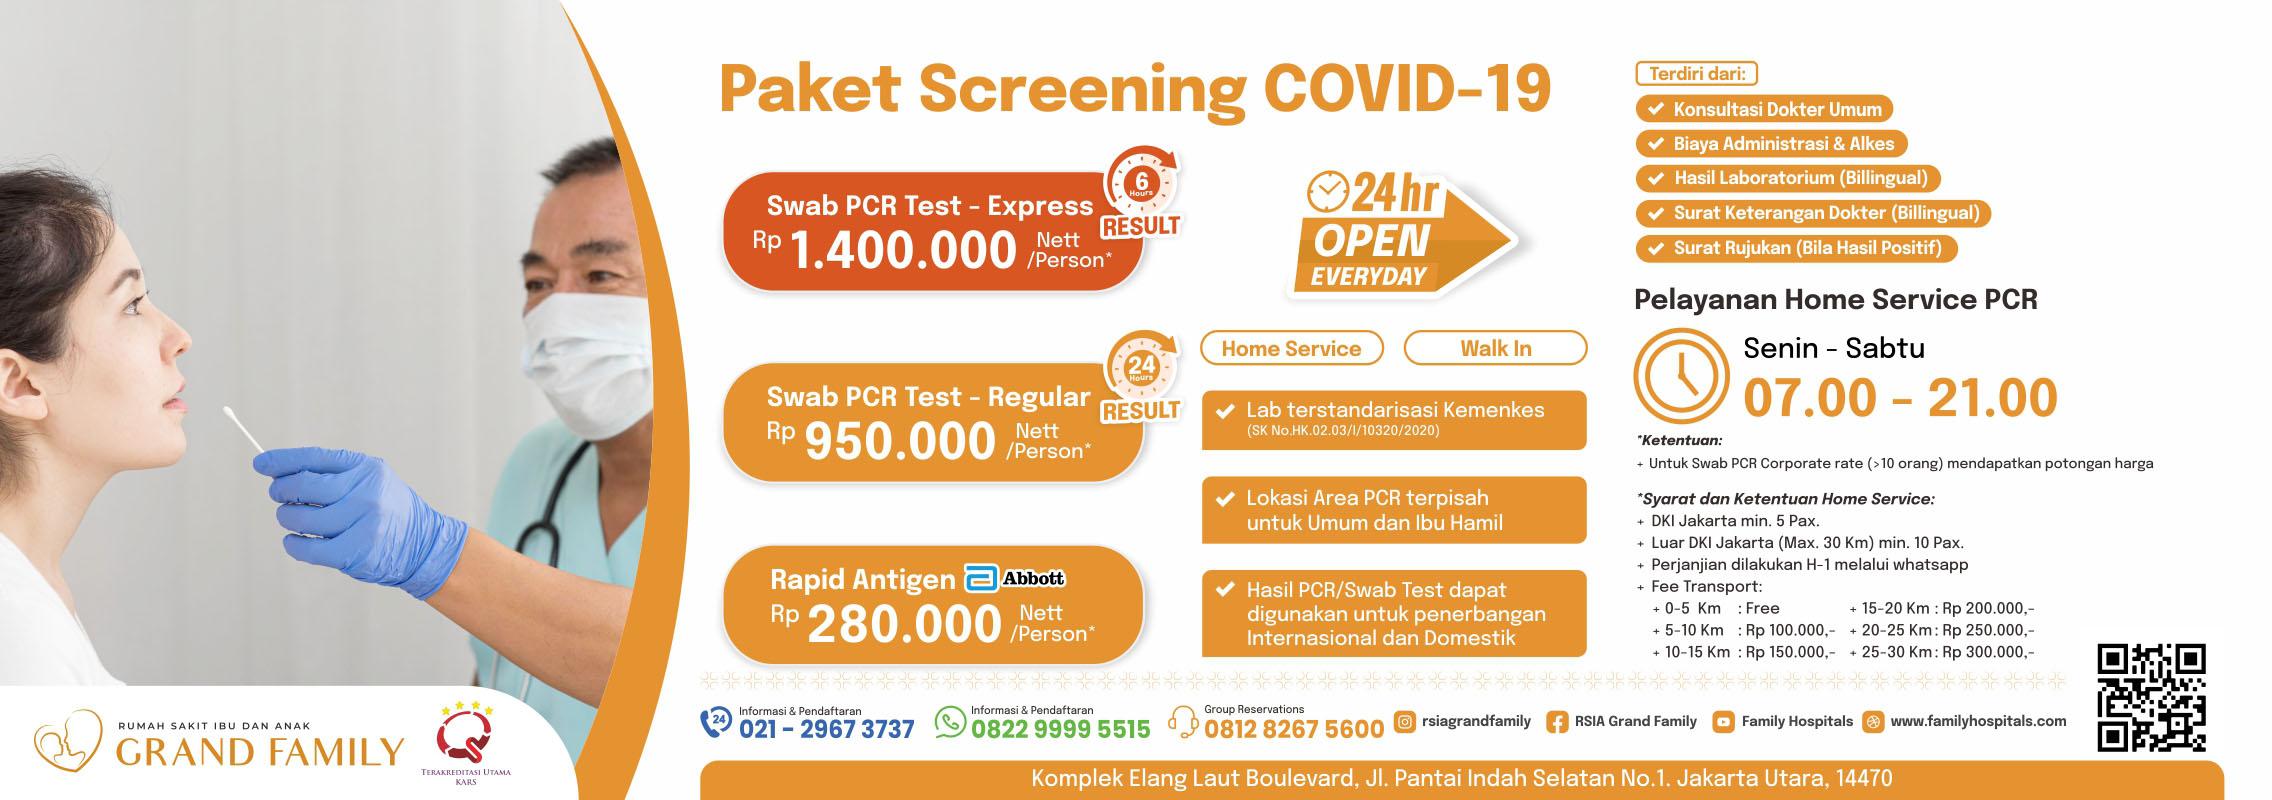 Paket Screening COVID-19